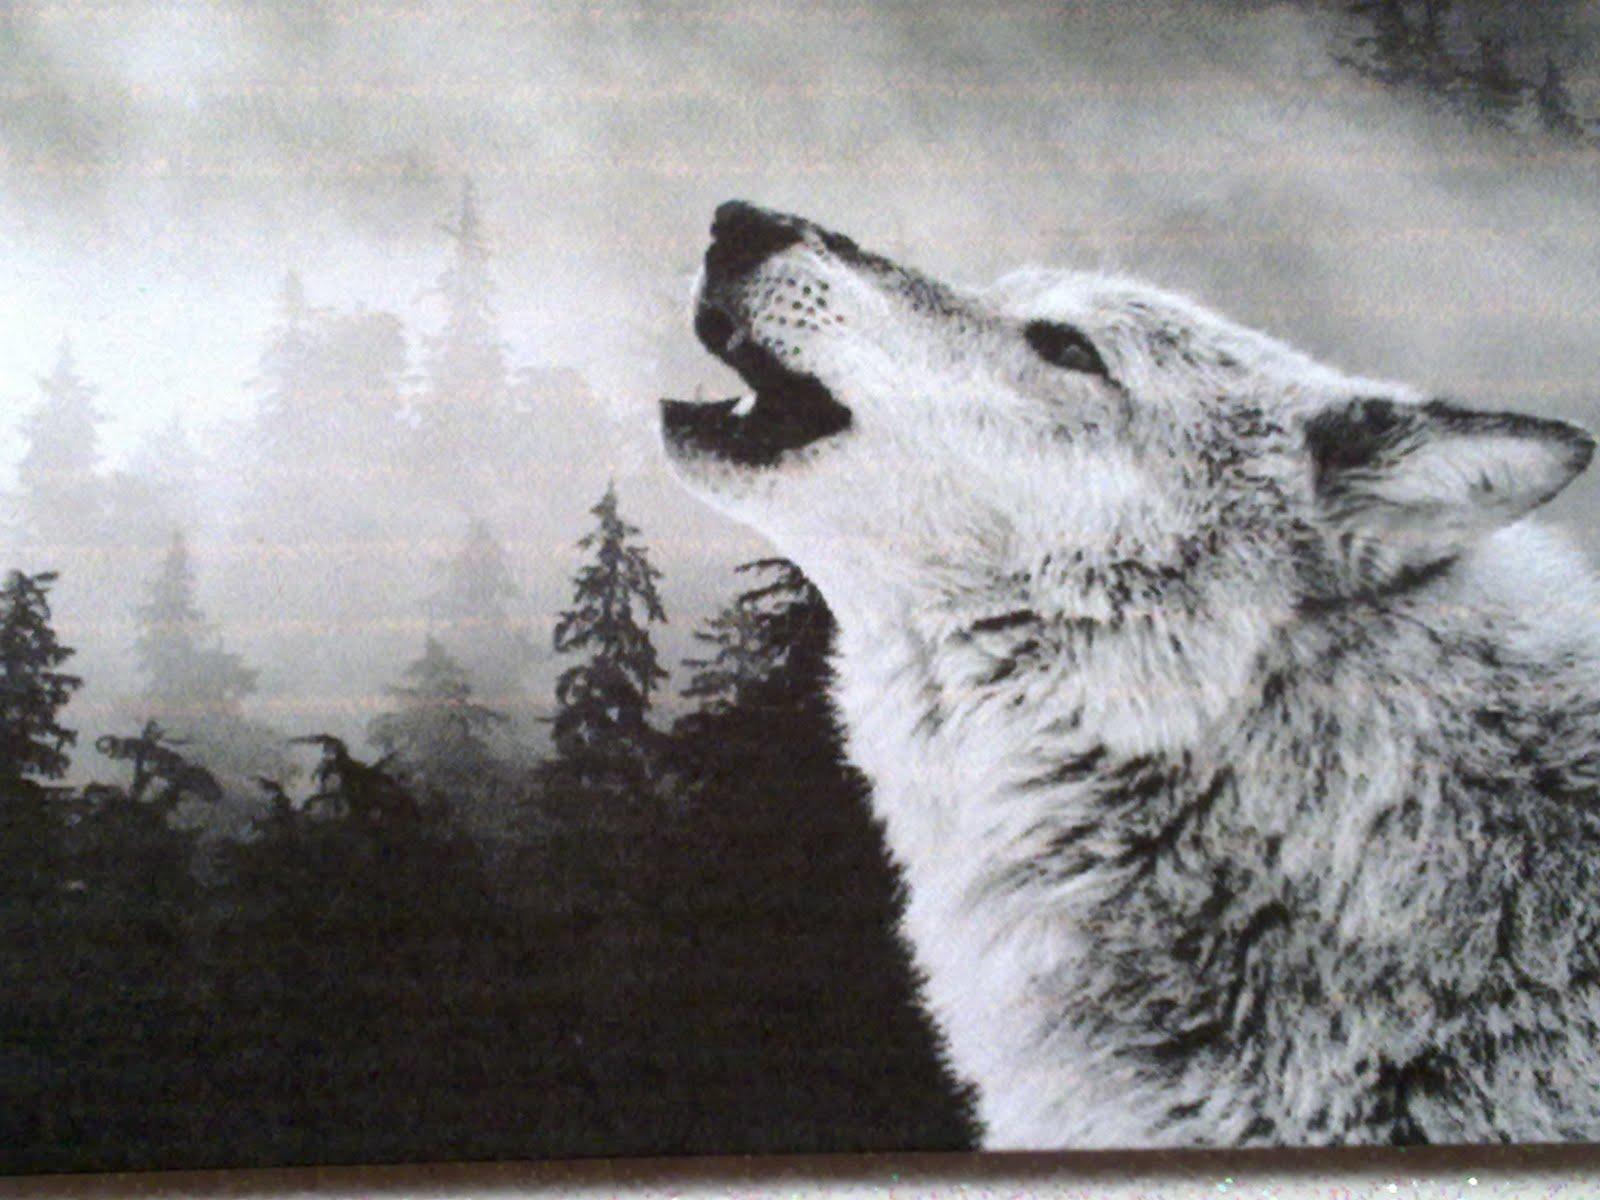 White wolf growling